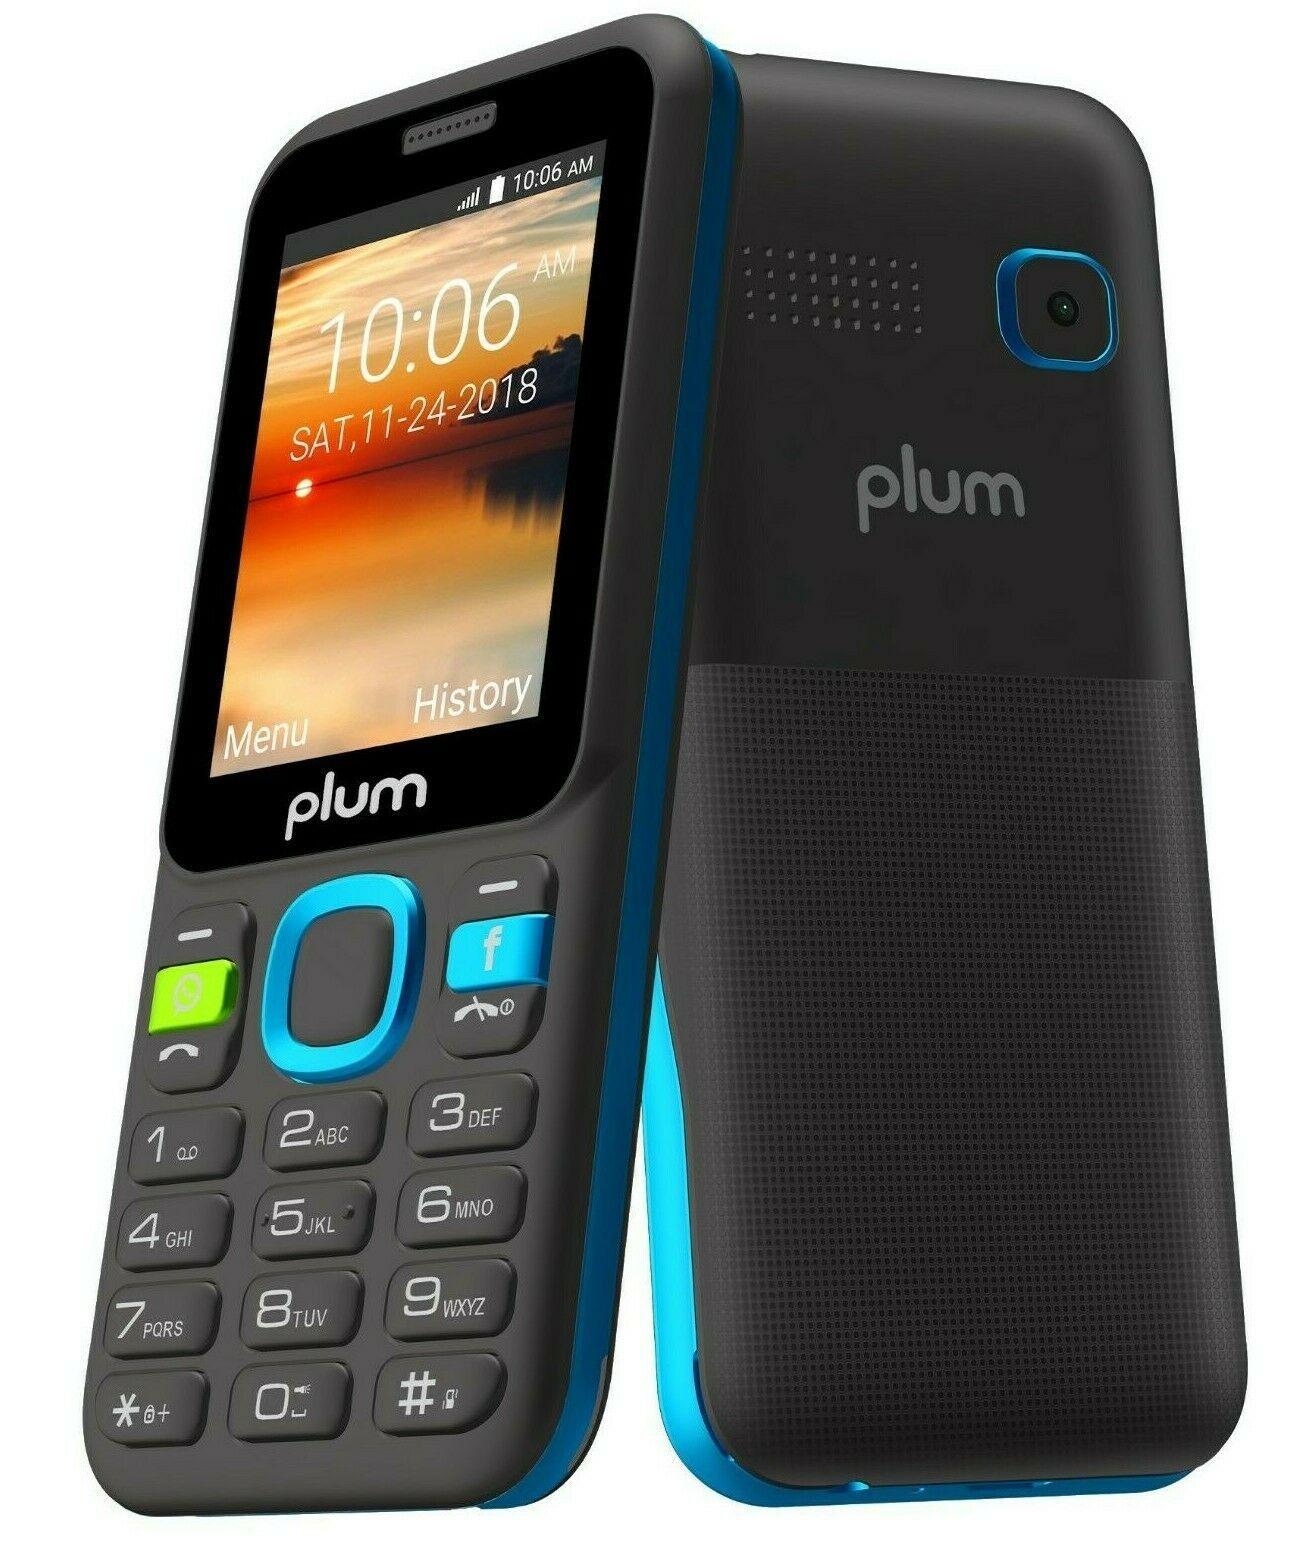 3g gsm unlocked phone feature 24 display big keypad att